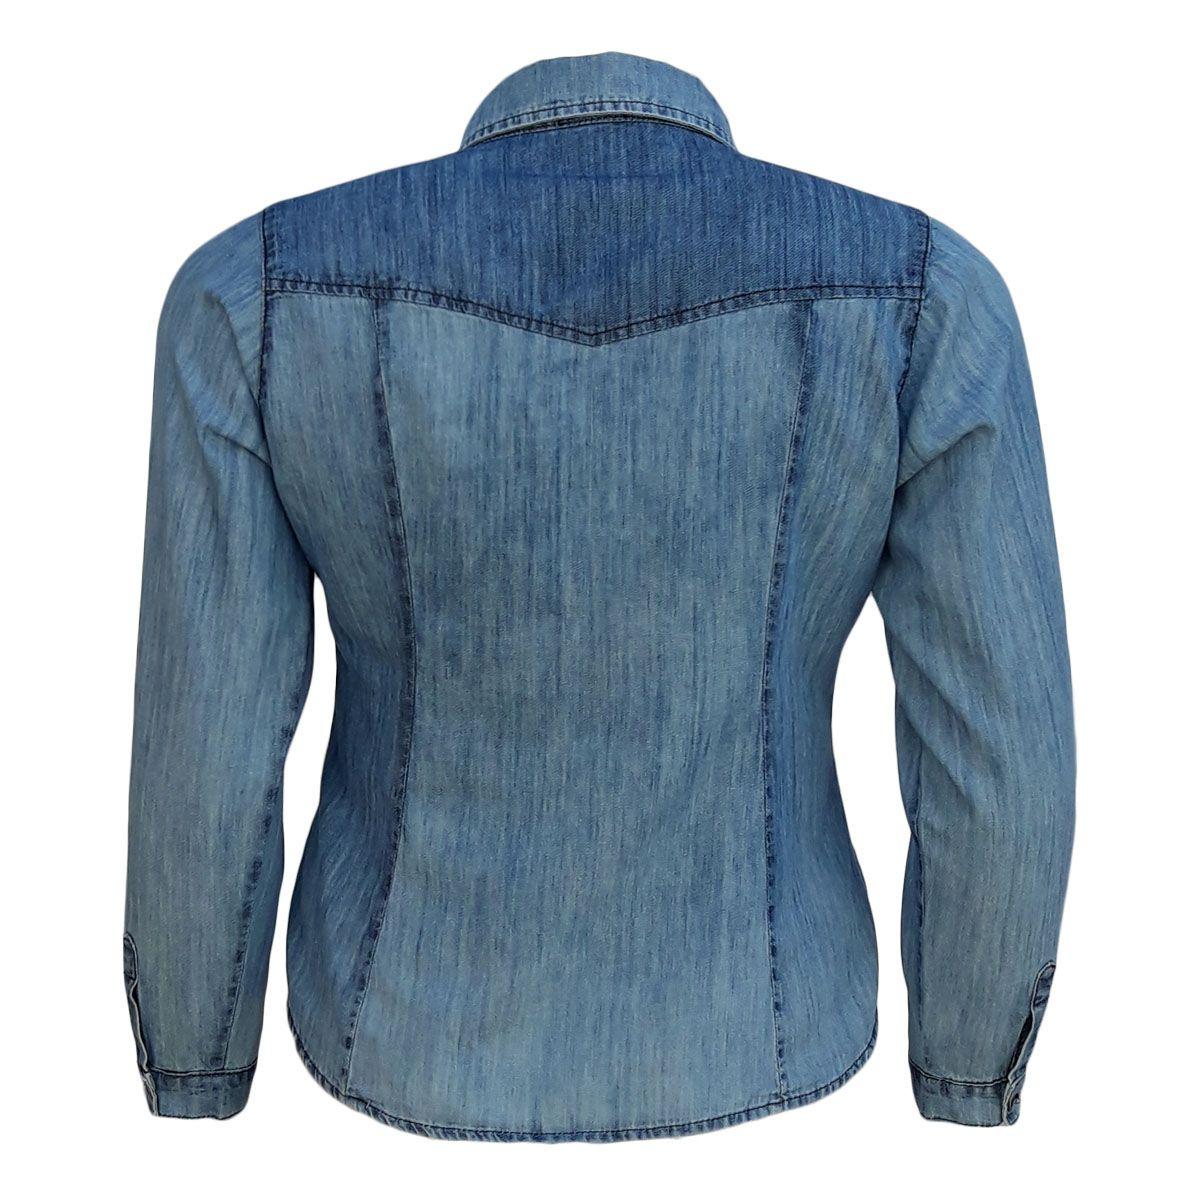 Camisa Jeans Feminina Manga Longa Sky Blue Plus Size